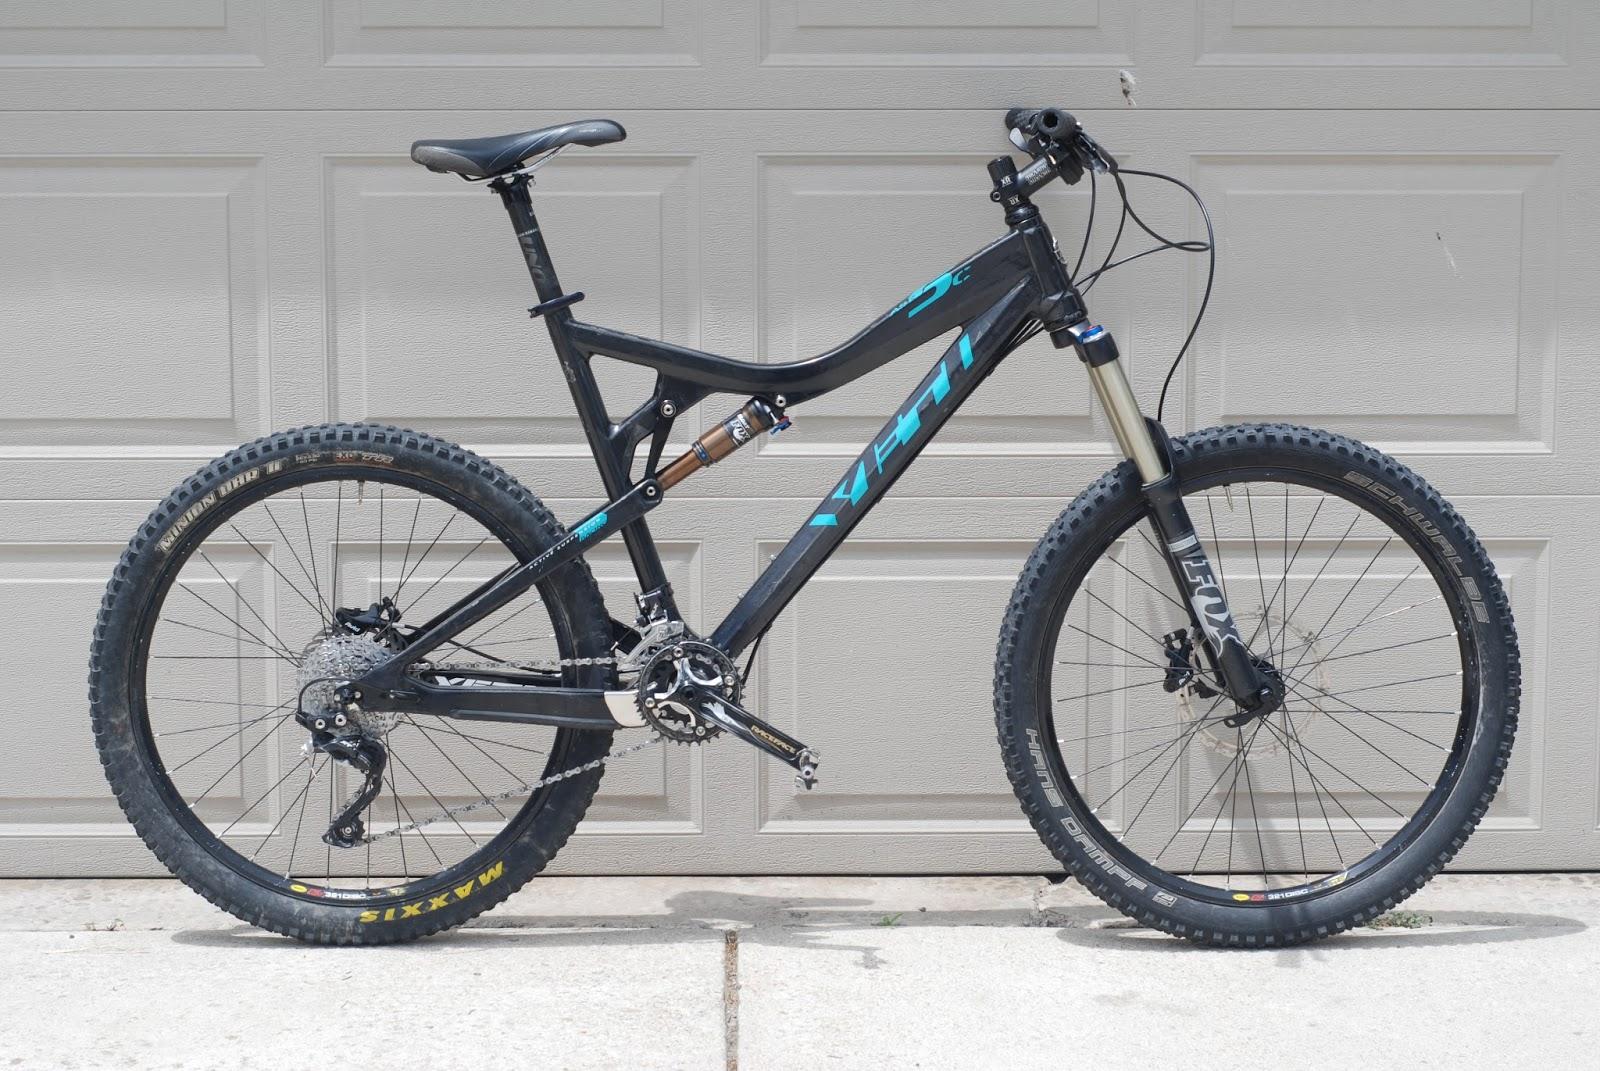 Yeti 2011 As R 5 Carbon Enduro Bike Reviews Comparisons